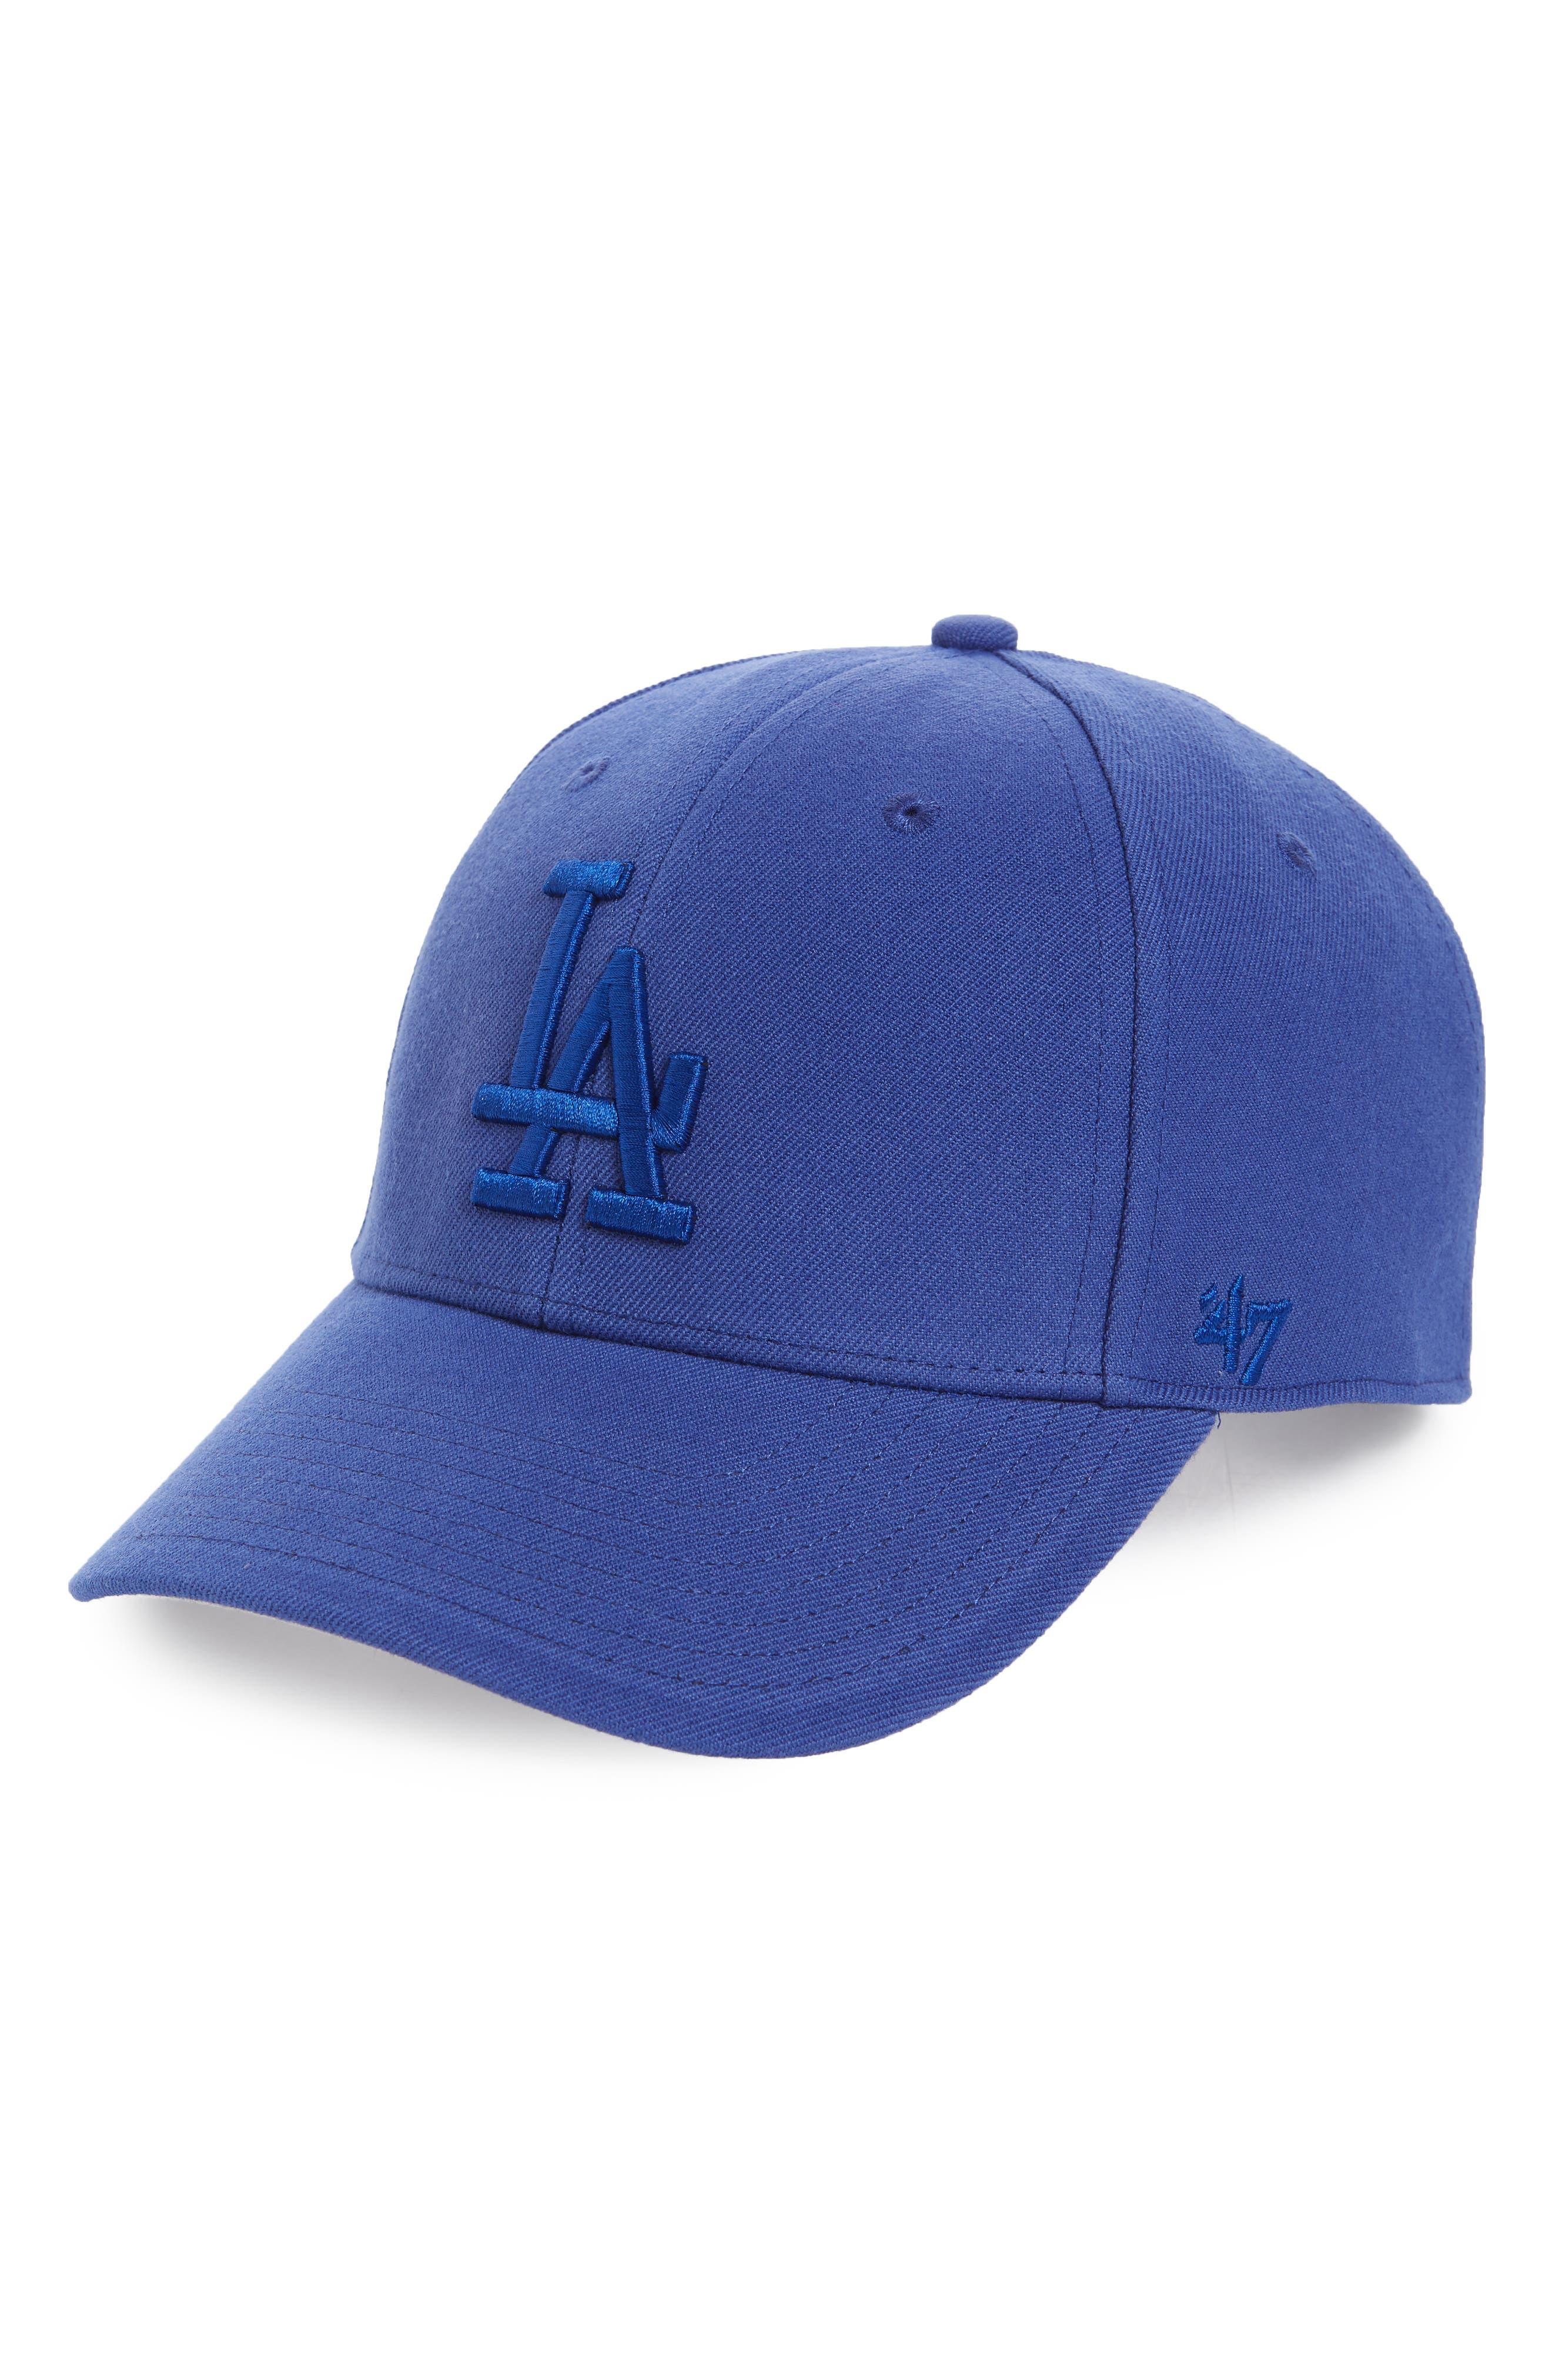 MVP LA Dodgers Baseball Cap,                         Main,                         color, 400